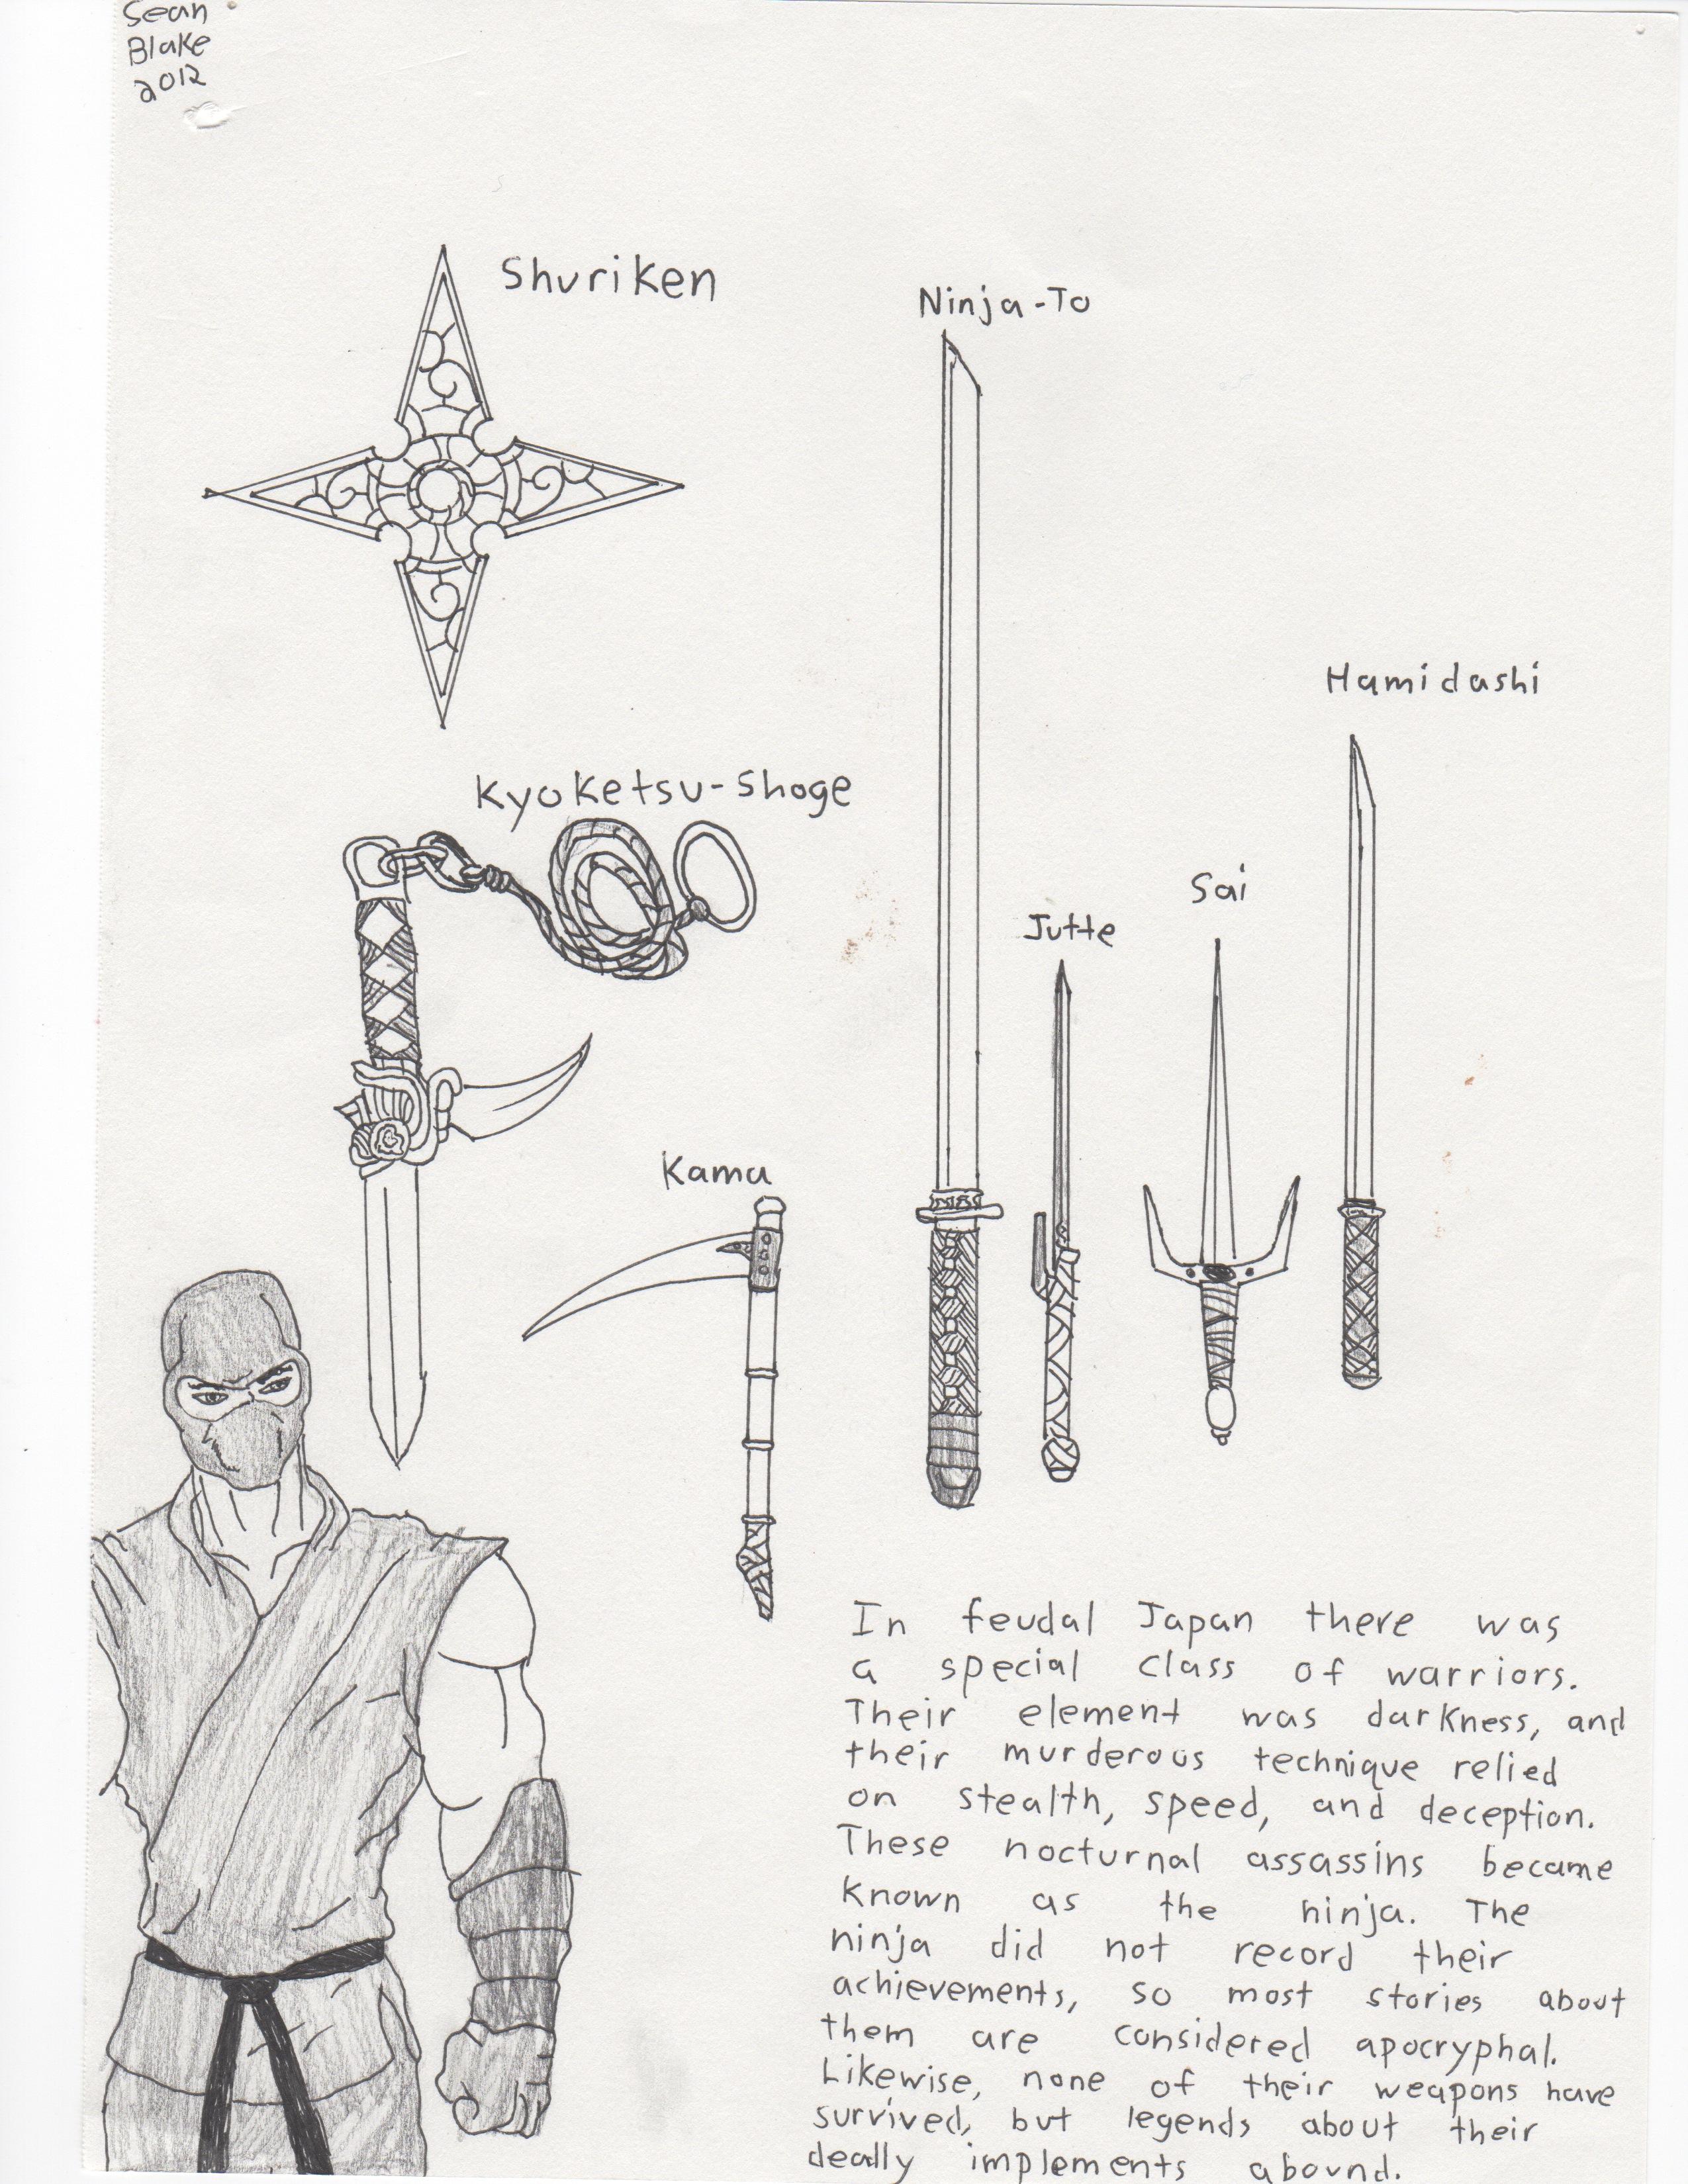 Kyoketsu Shoge Ninja Weapons by Xenom...